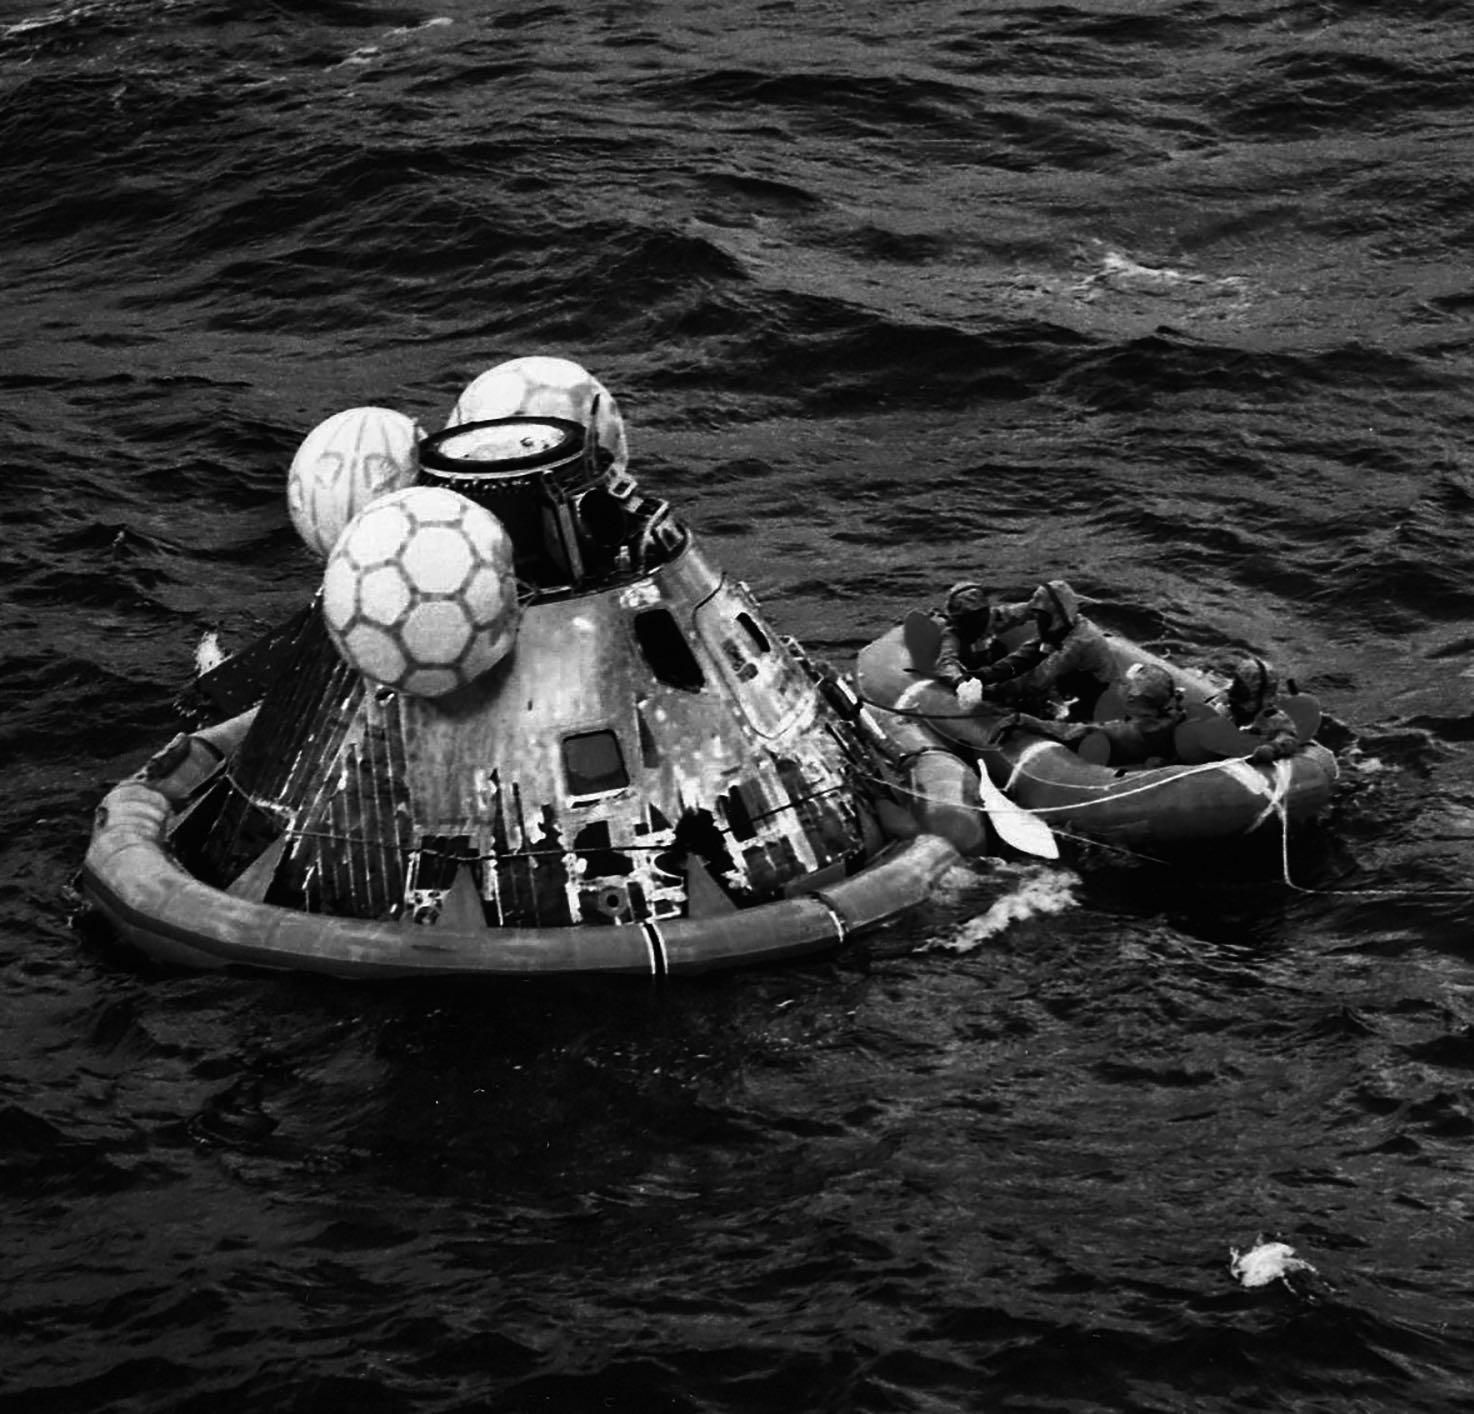 16-50-35_Splashdown - Credit NASA